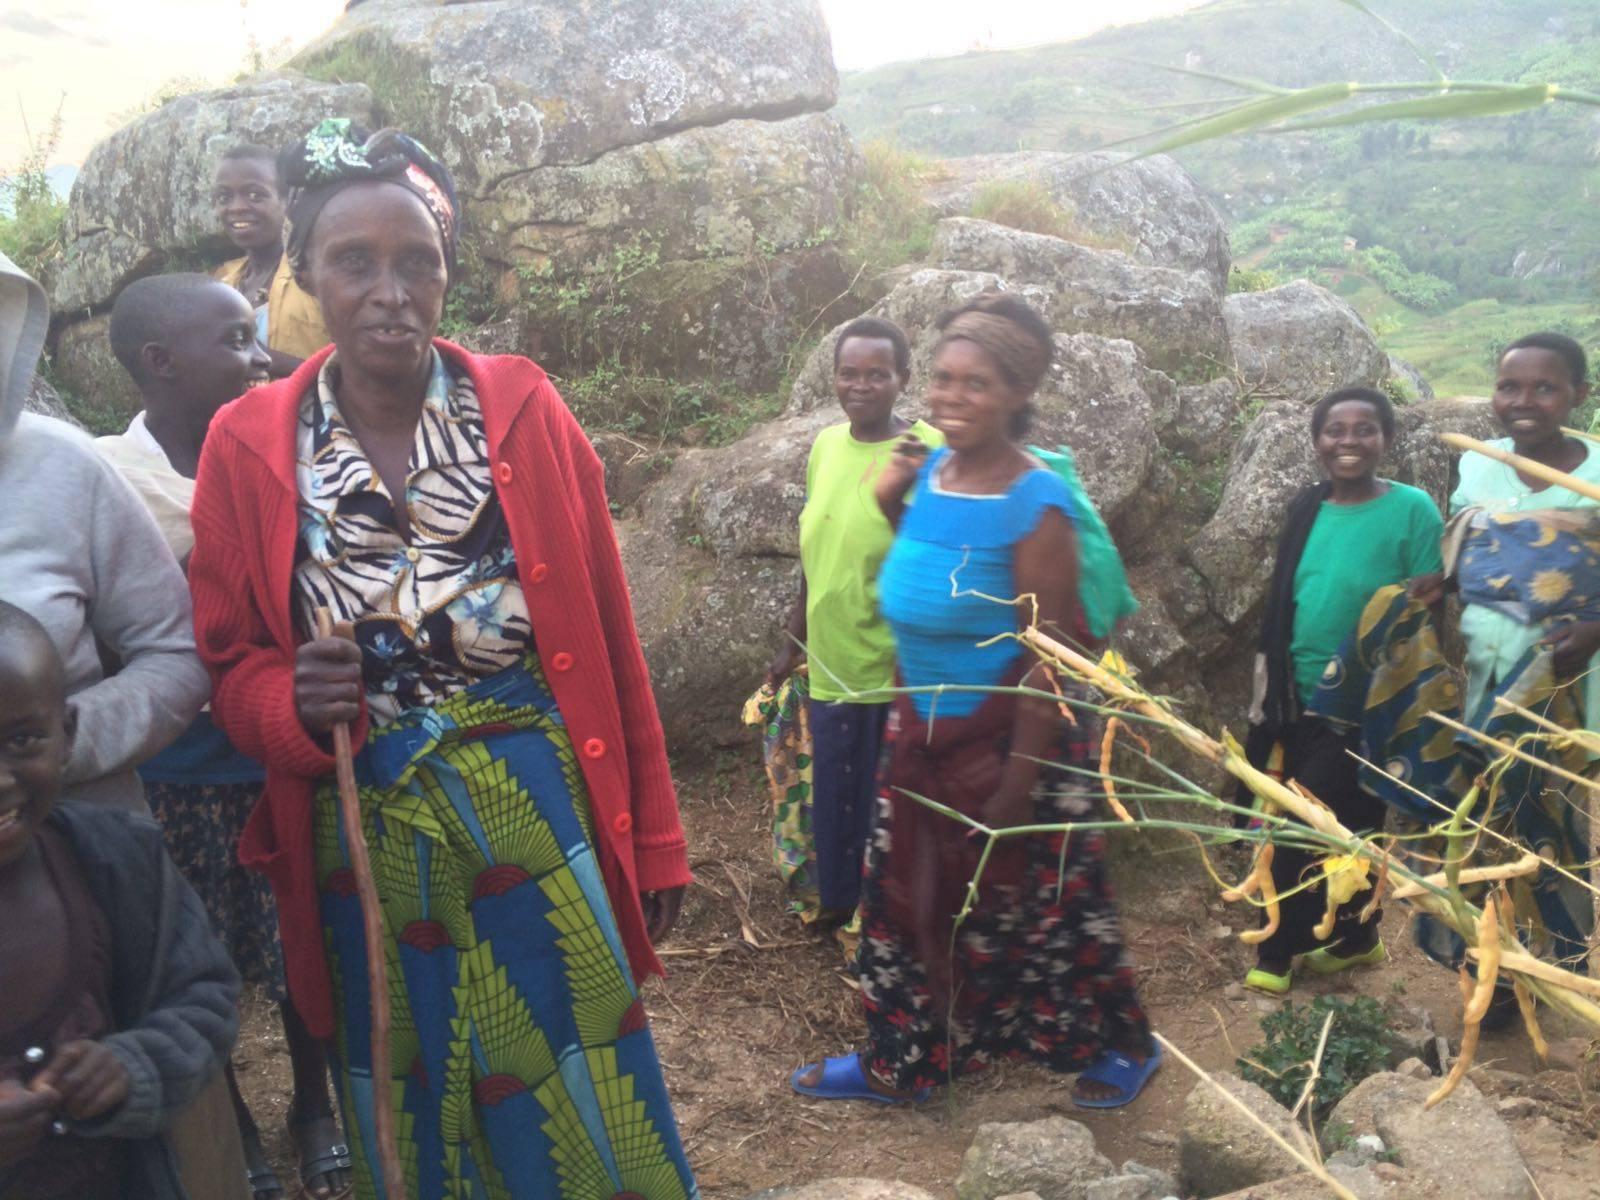 Outreach Mission trip to Rwanda